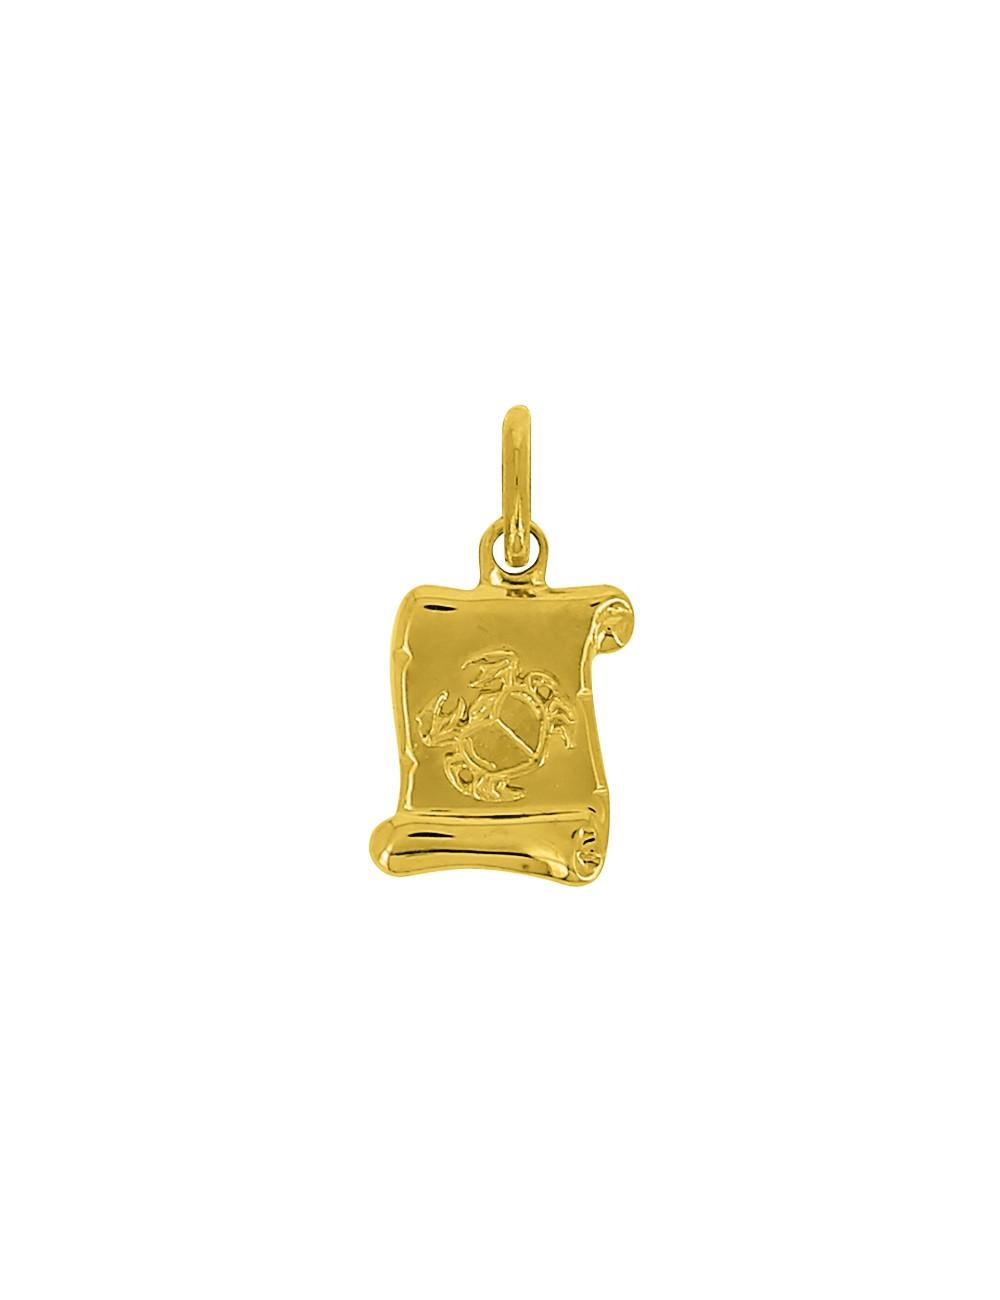 Pendentif Signe Du Zodiaque Cancer Or Jaune 18 Carats + Chaine Or Jaune 18 Carats Offerte